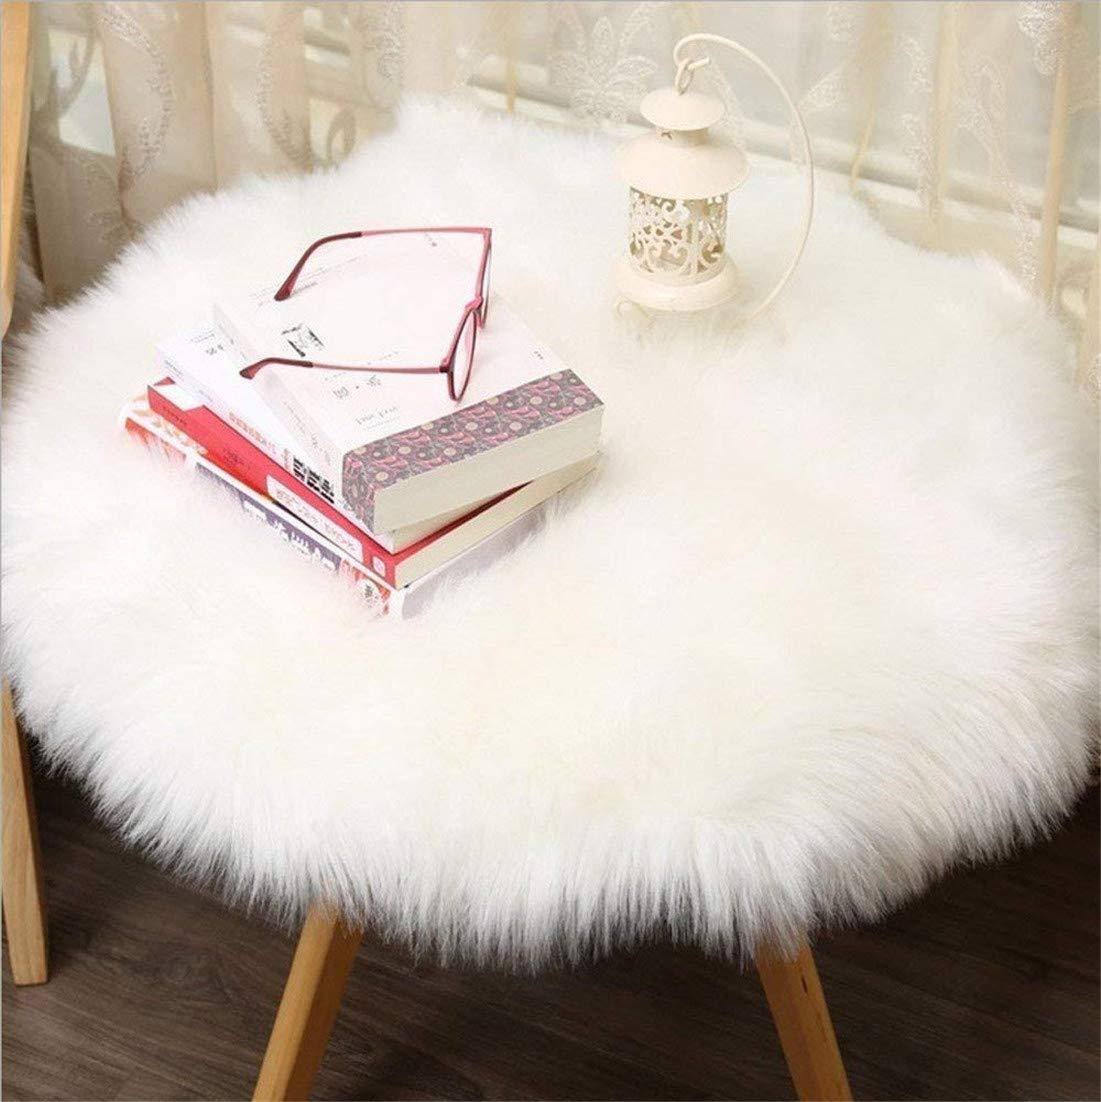 HEQUN Circular Faux Fur Sheepskin Style Rug Faux Fleece Chair Cover Seat Pad Soft Fluffy Shaggy Area Rugs For Bedroom Sofa Floor (White, 45 X 45CM)